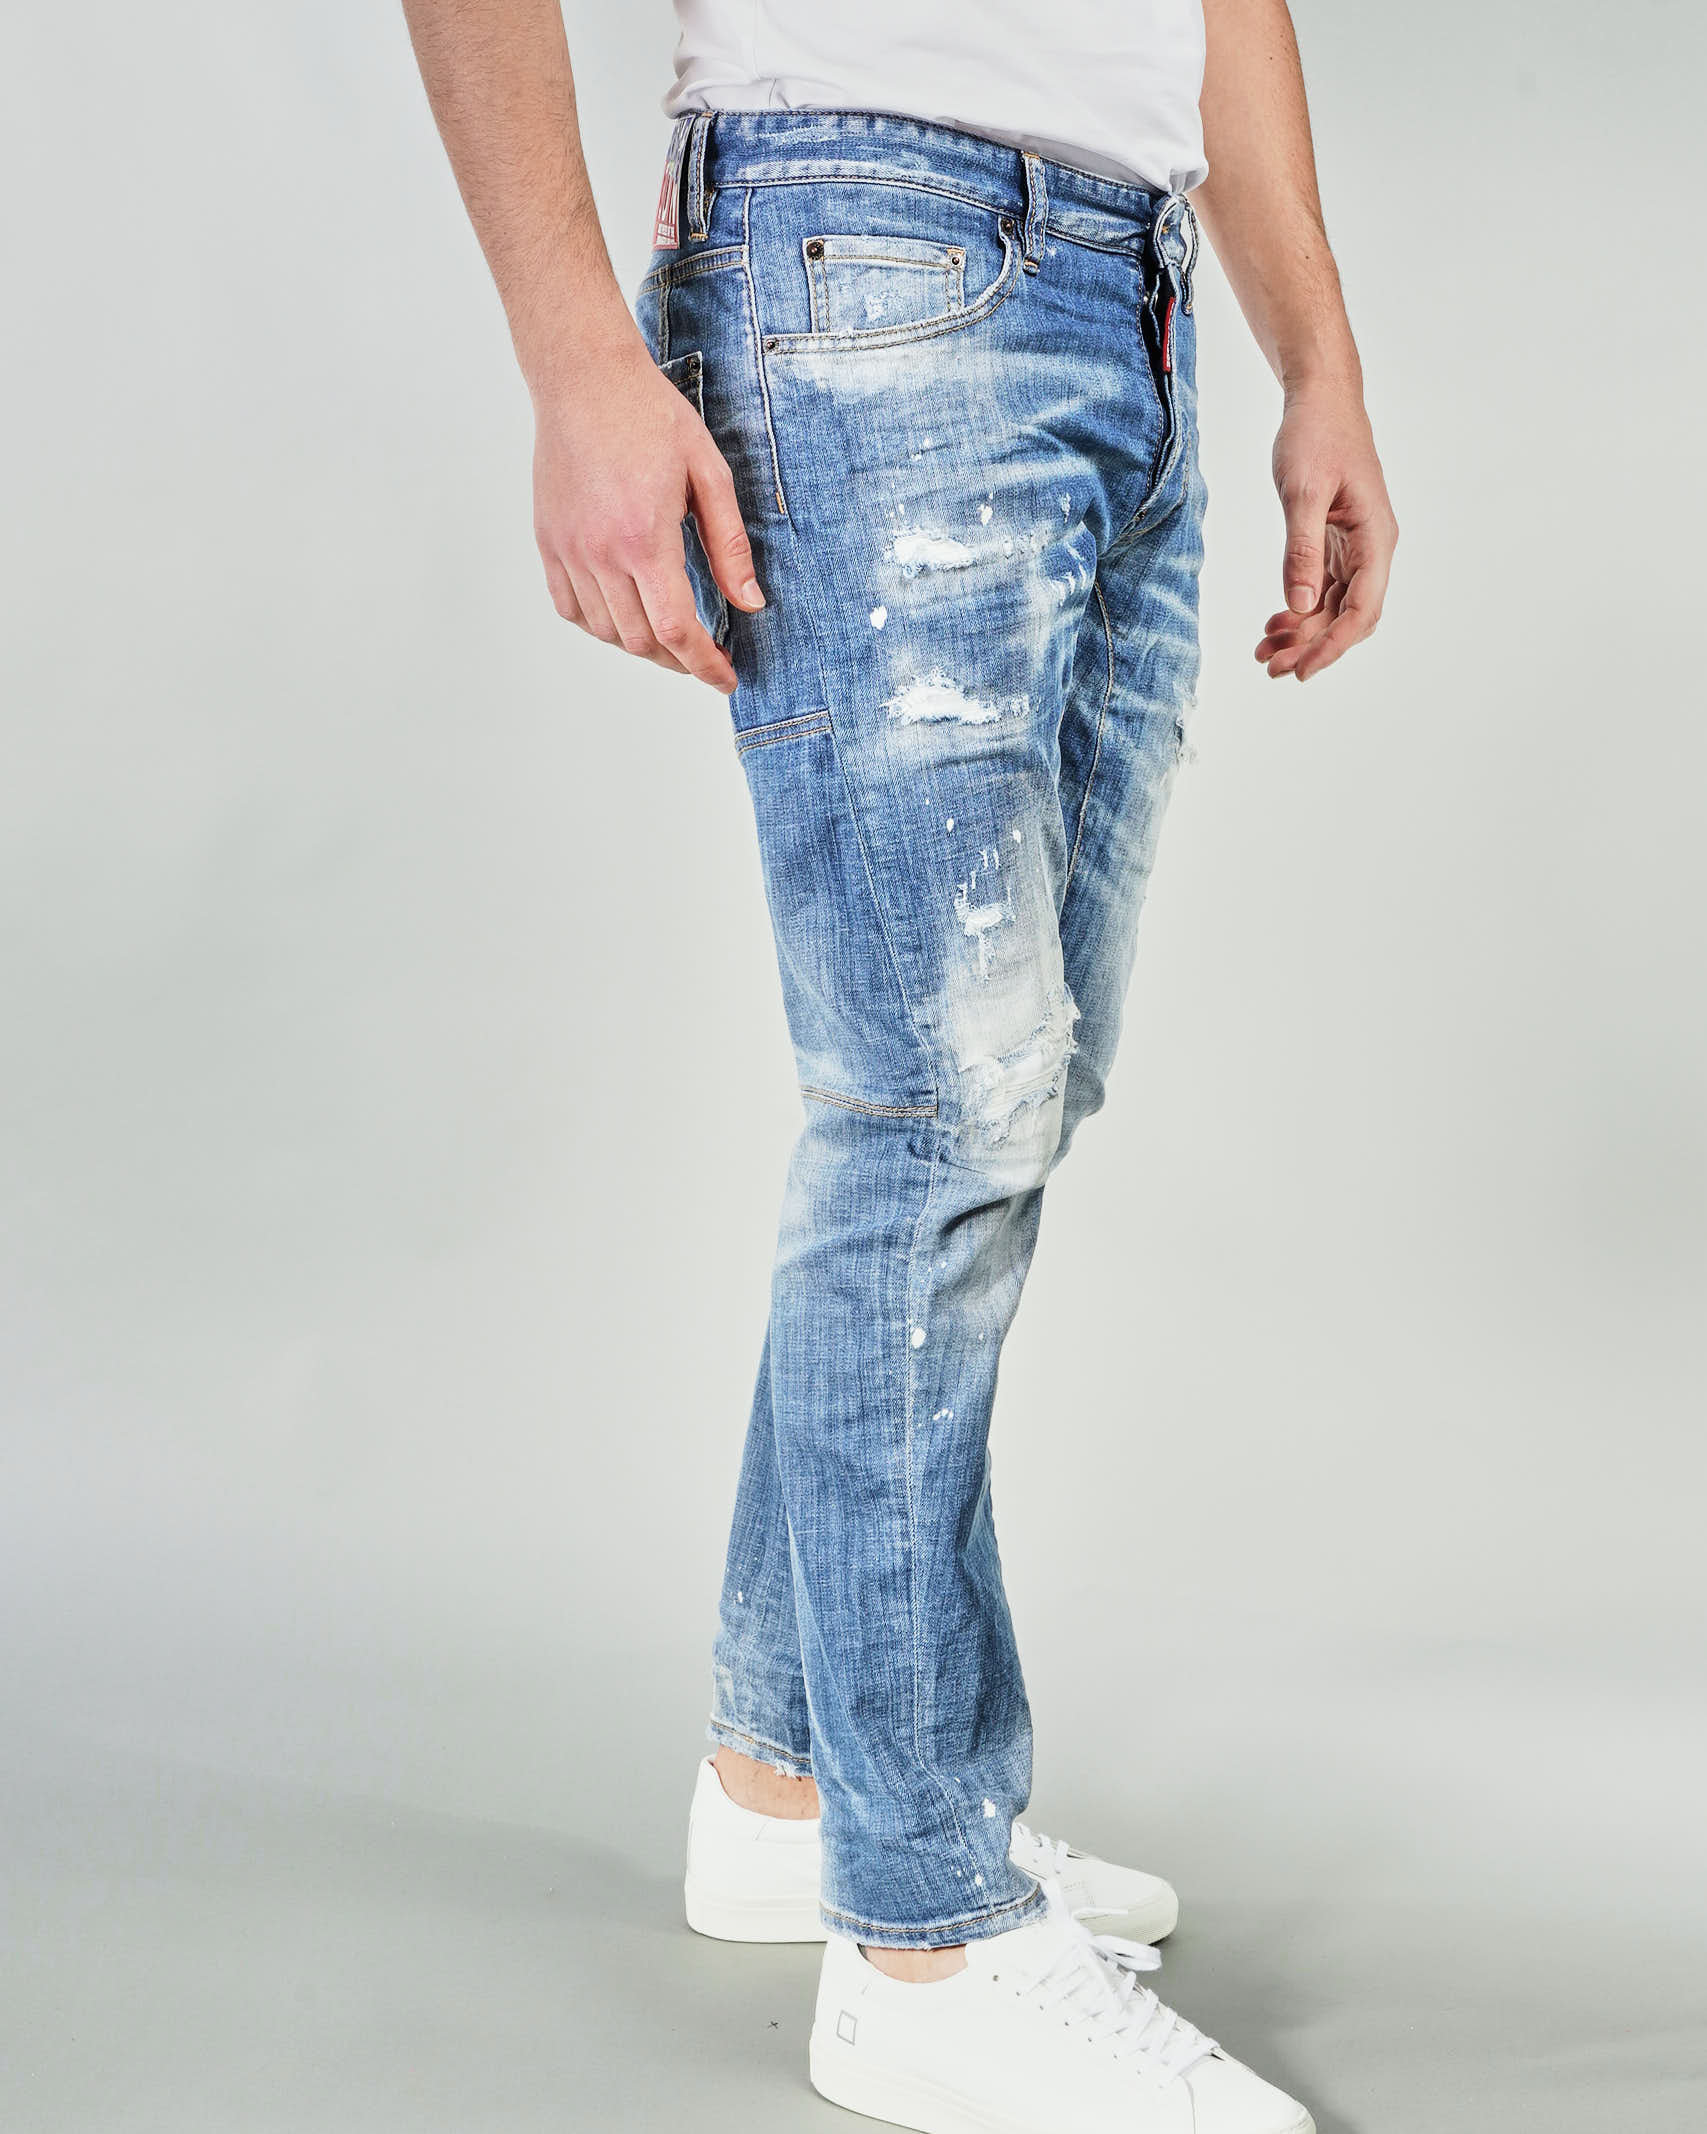 Jeans Ripped White Spots Wash Tidy Biker Dsquared DSQUARED | Jeans | S79LA0022DENIM